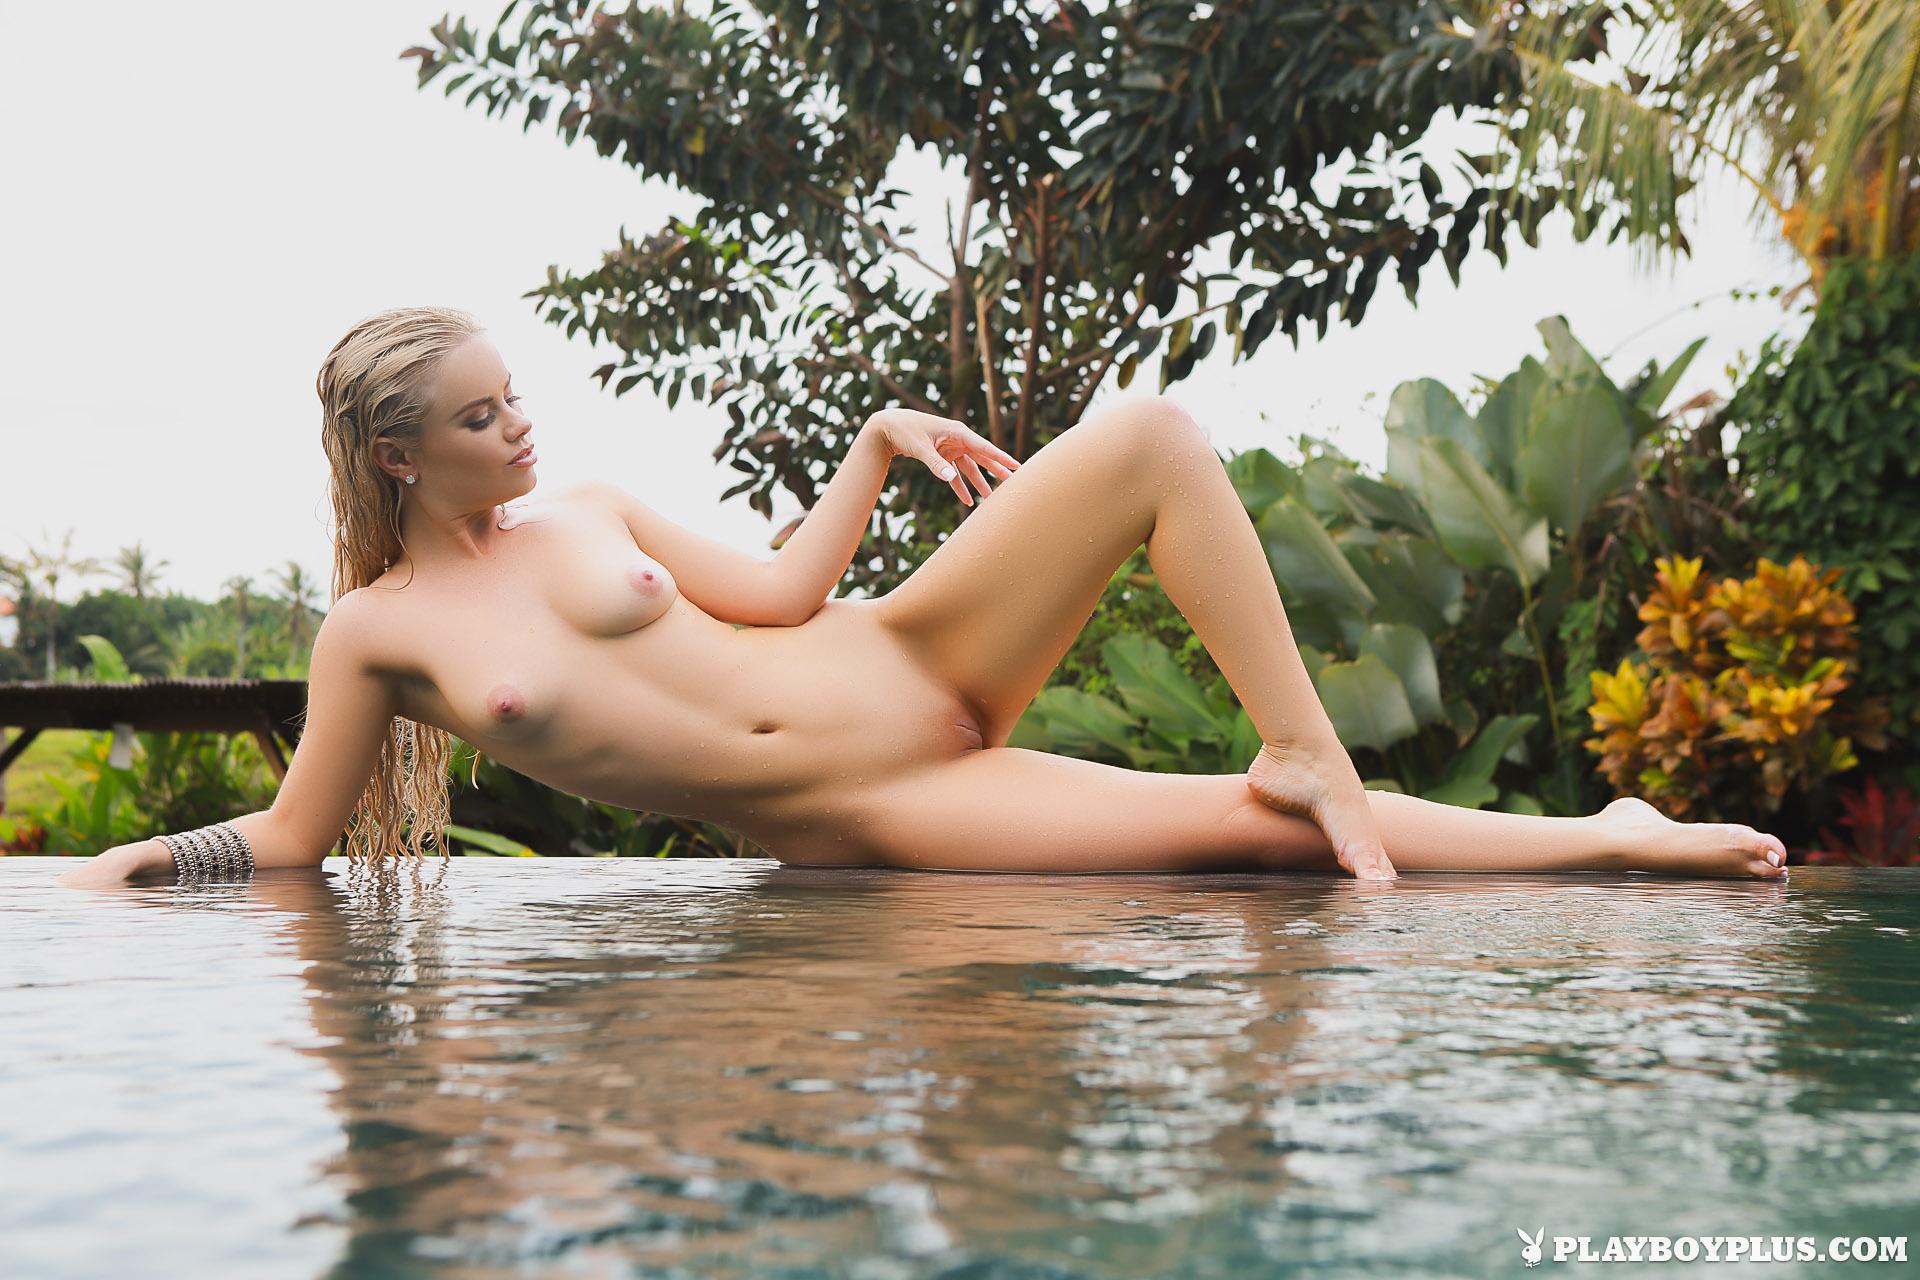 alana-wolfe-bikini-pool-naked-blonde-playboy-26